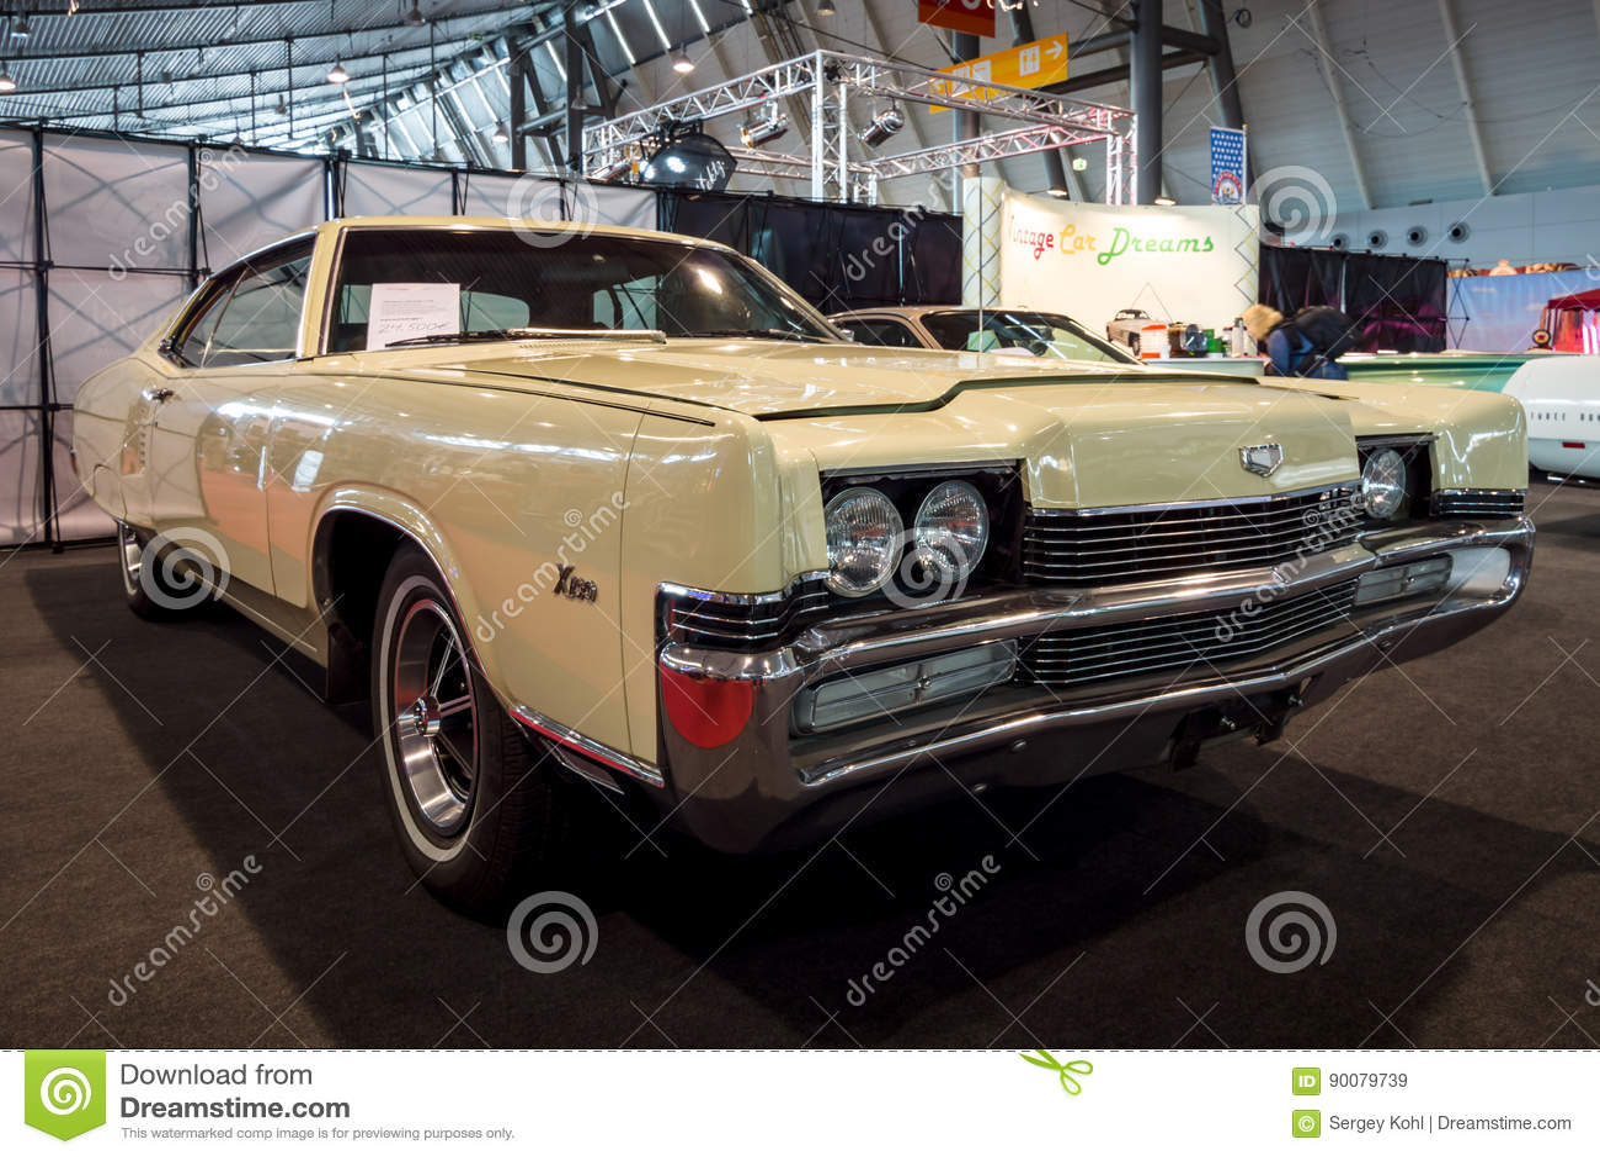 Full-size personal luxury car Mercury Marauder X-100, 1969.